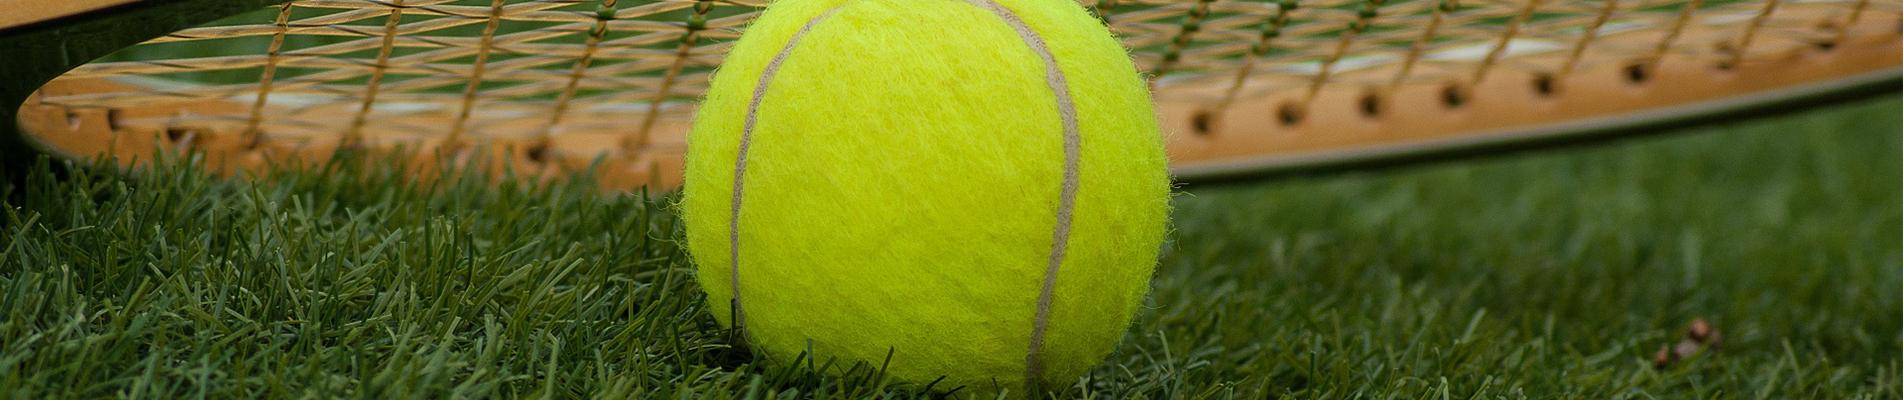 What can Wimbledon teach marketers?